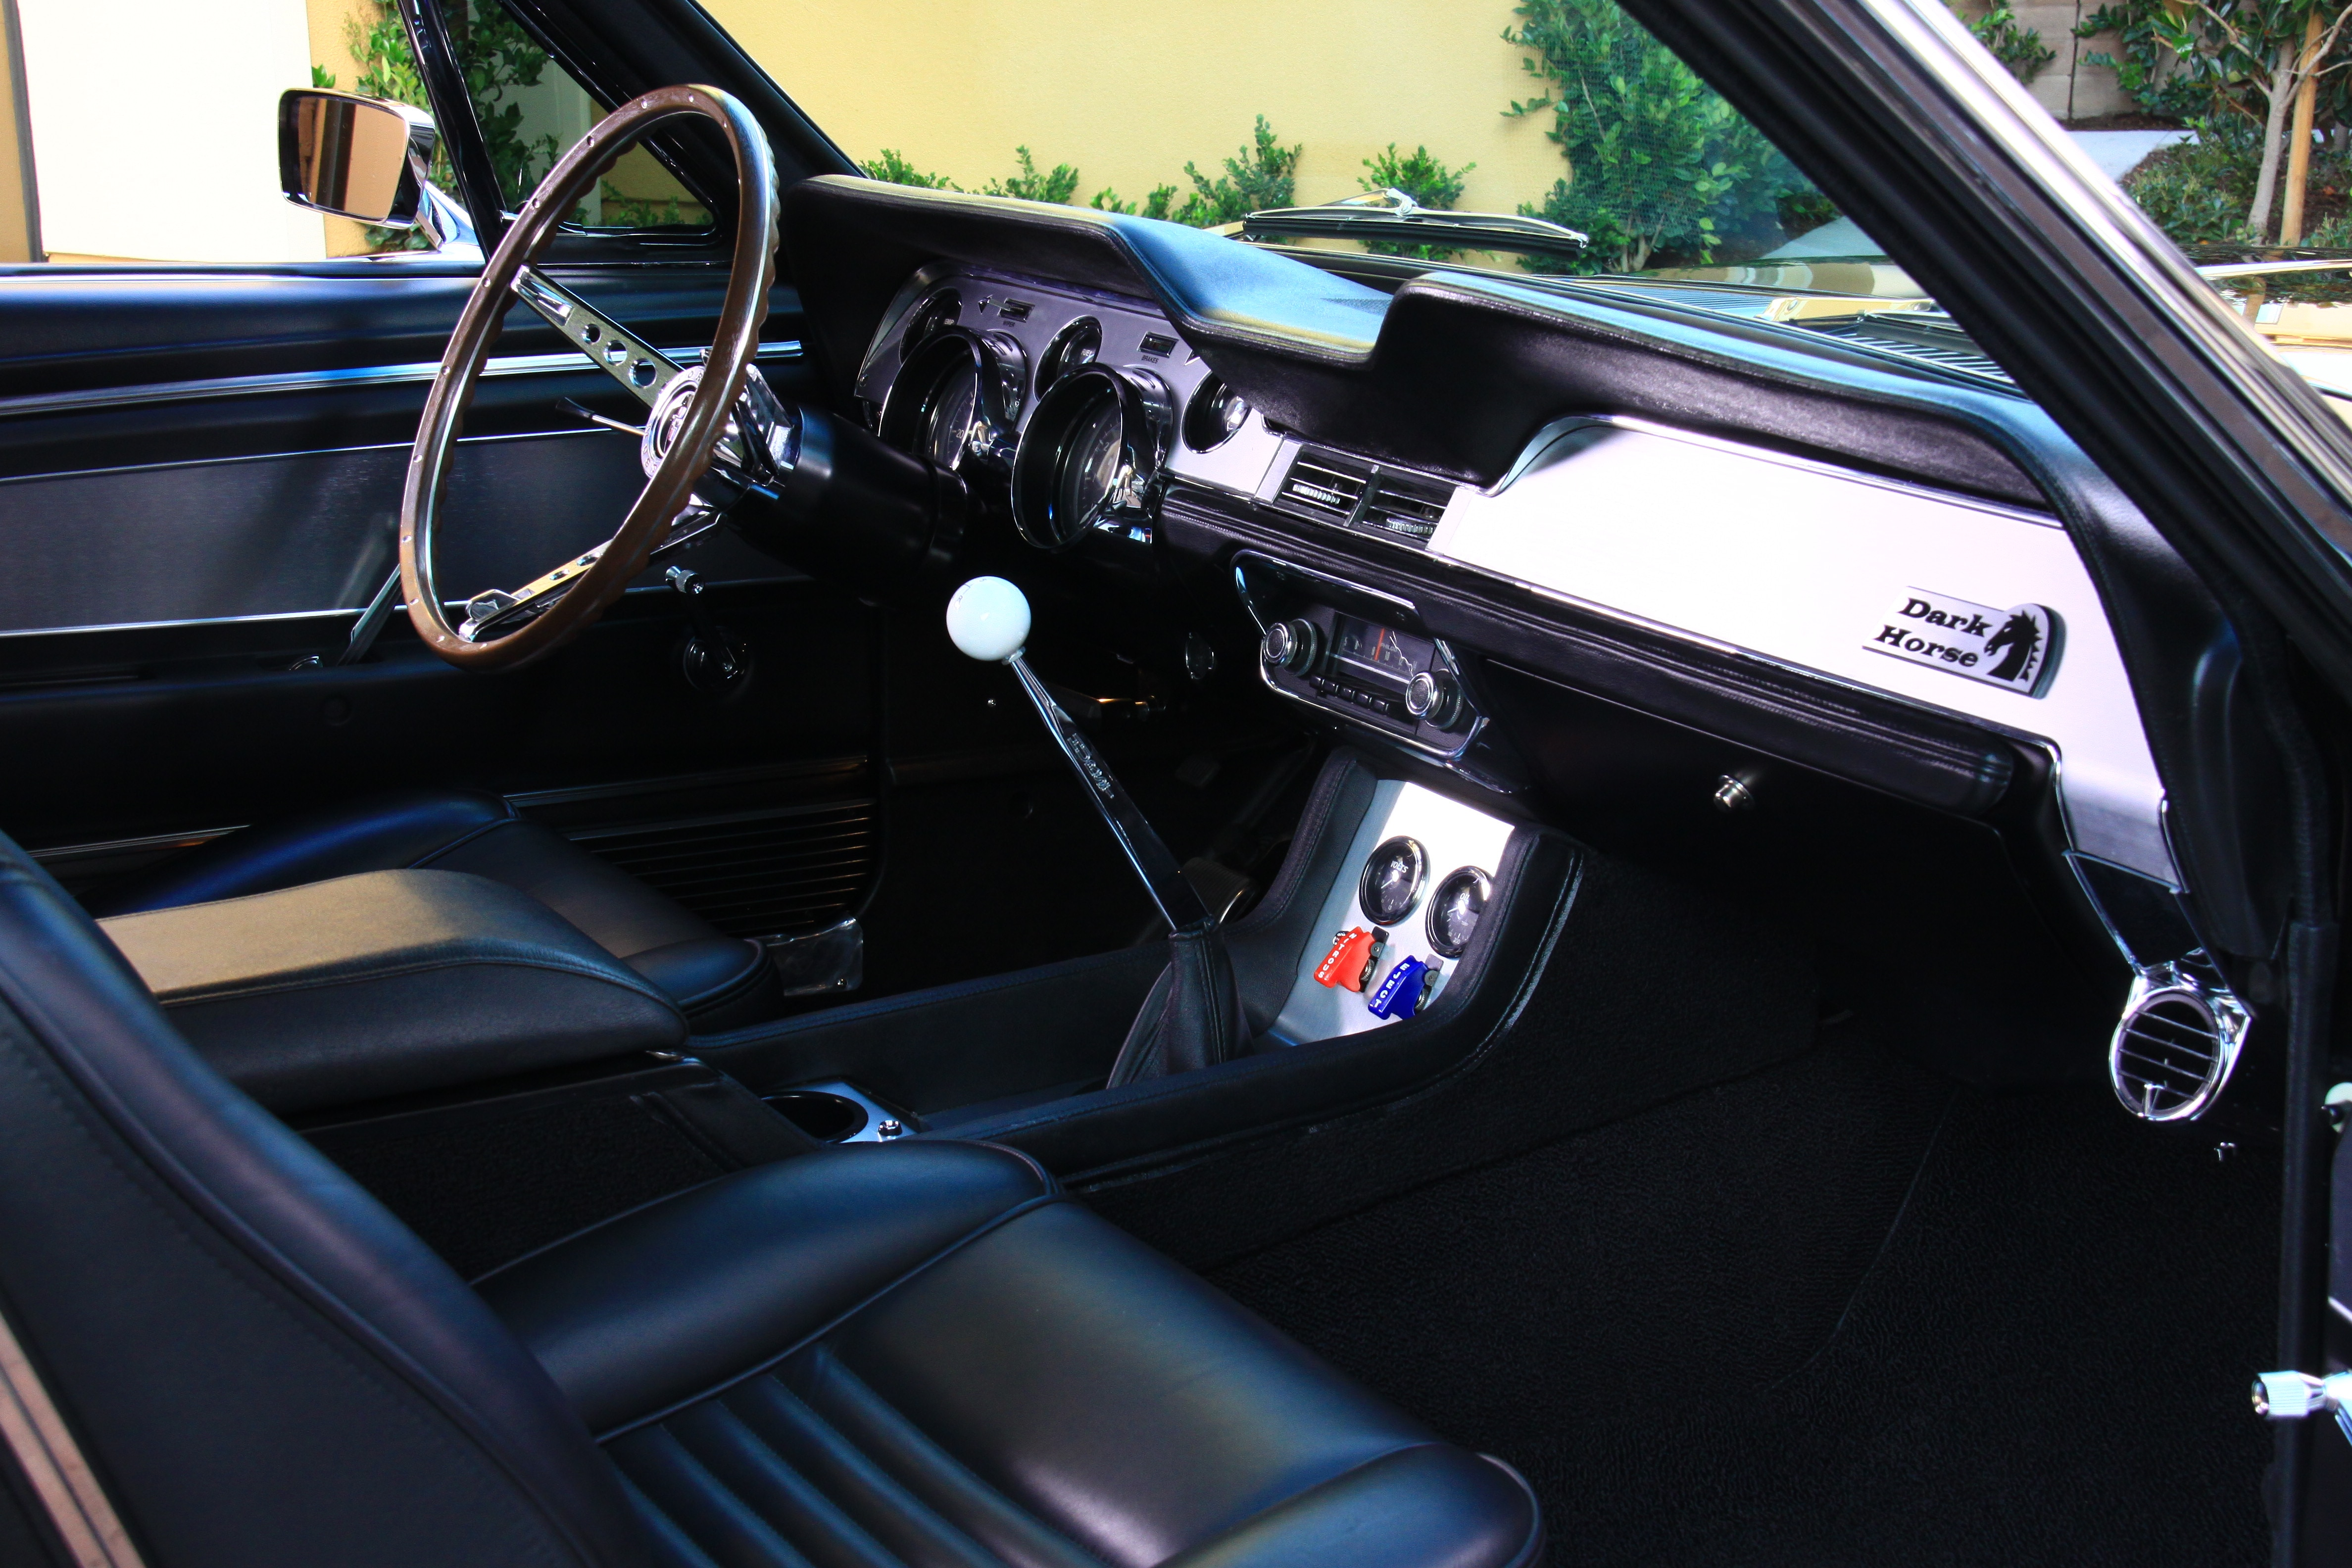 19 1967 Ford Mustang Interior